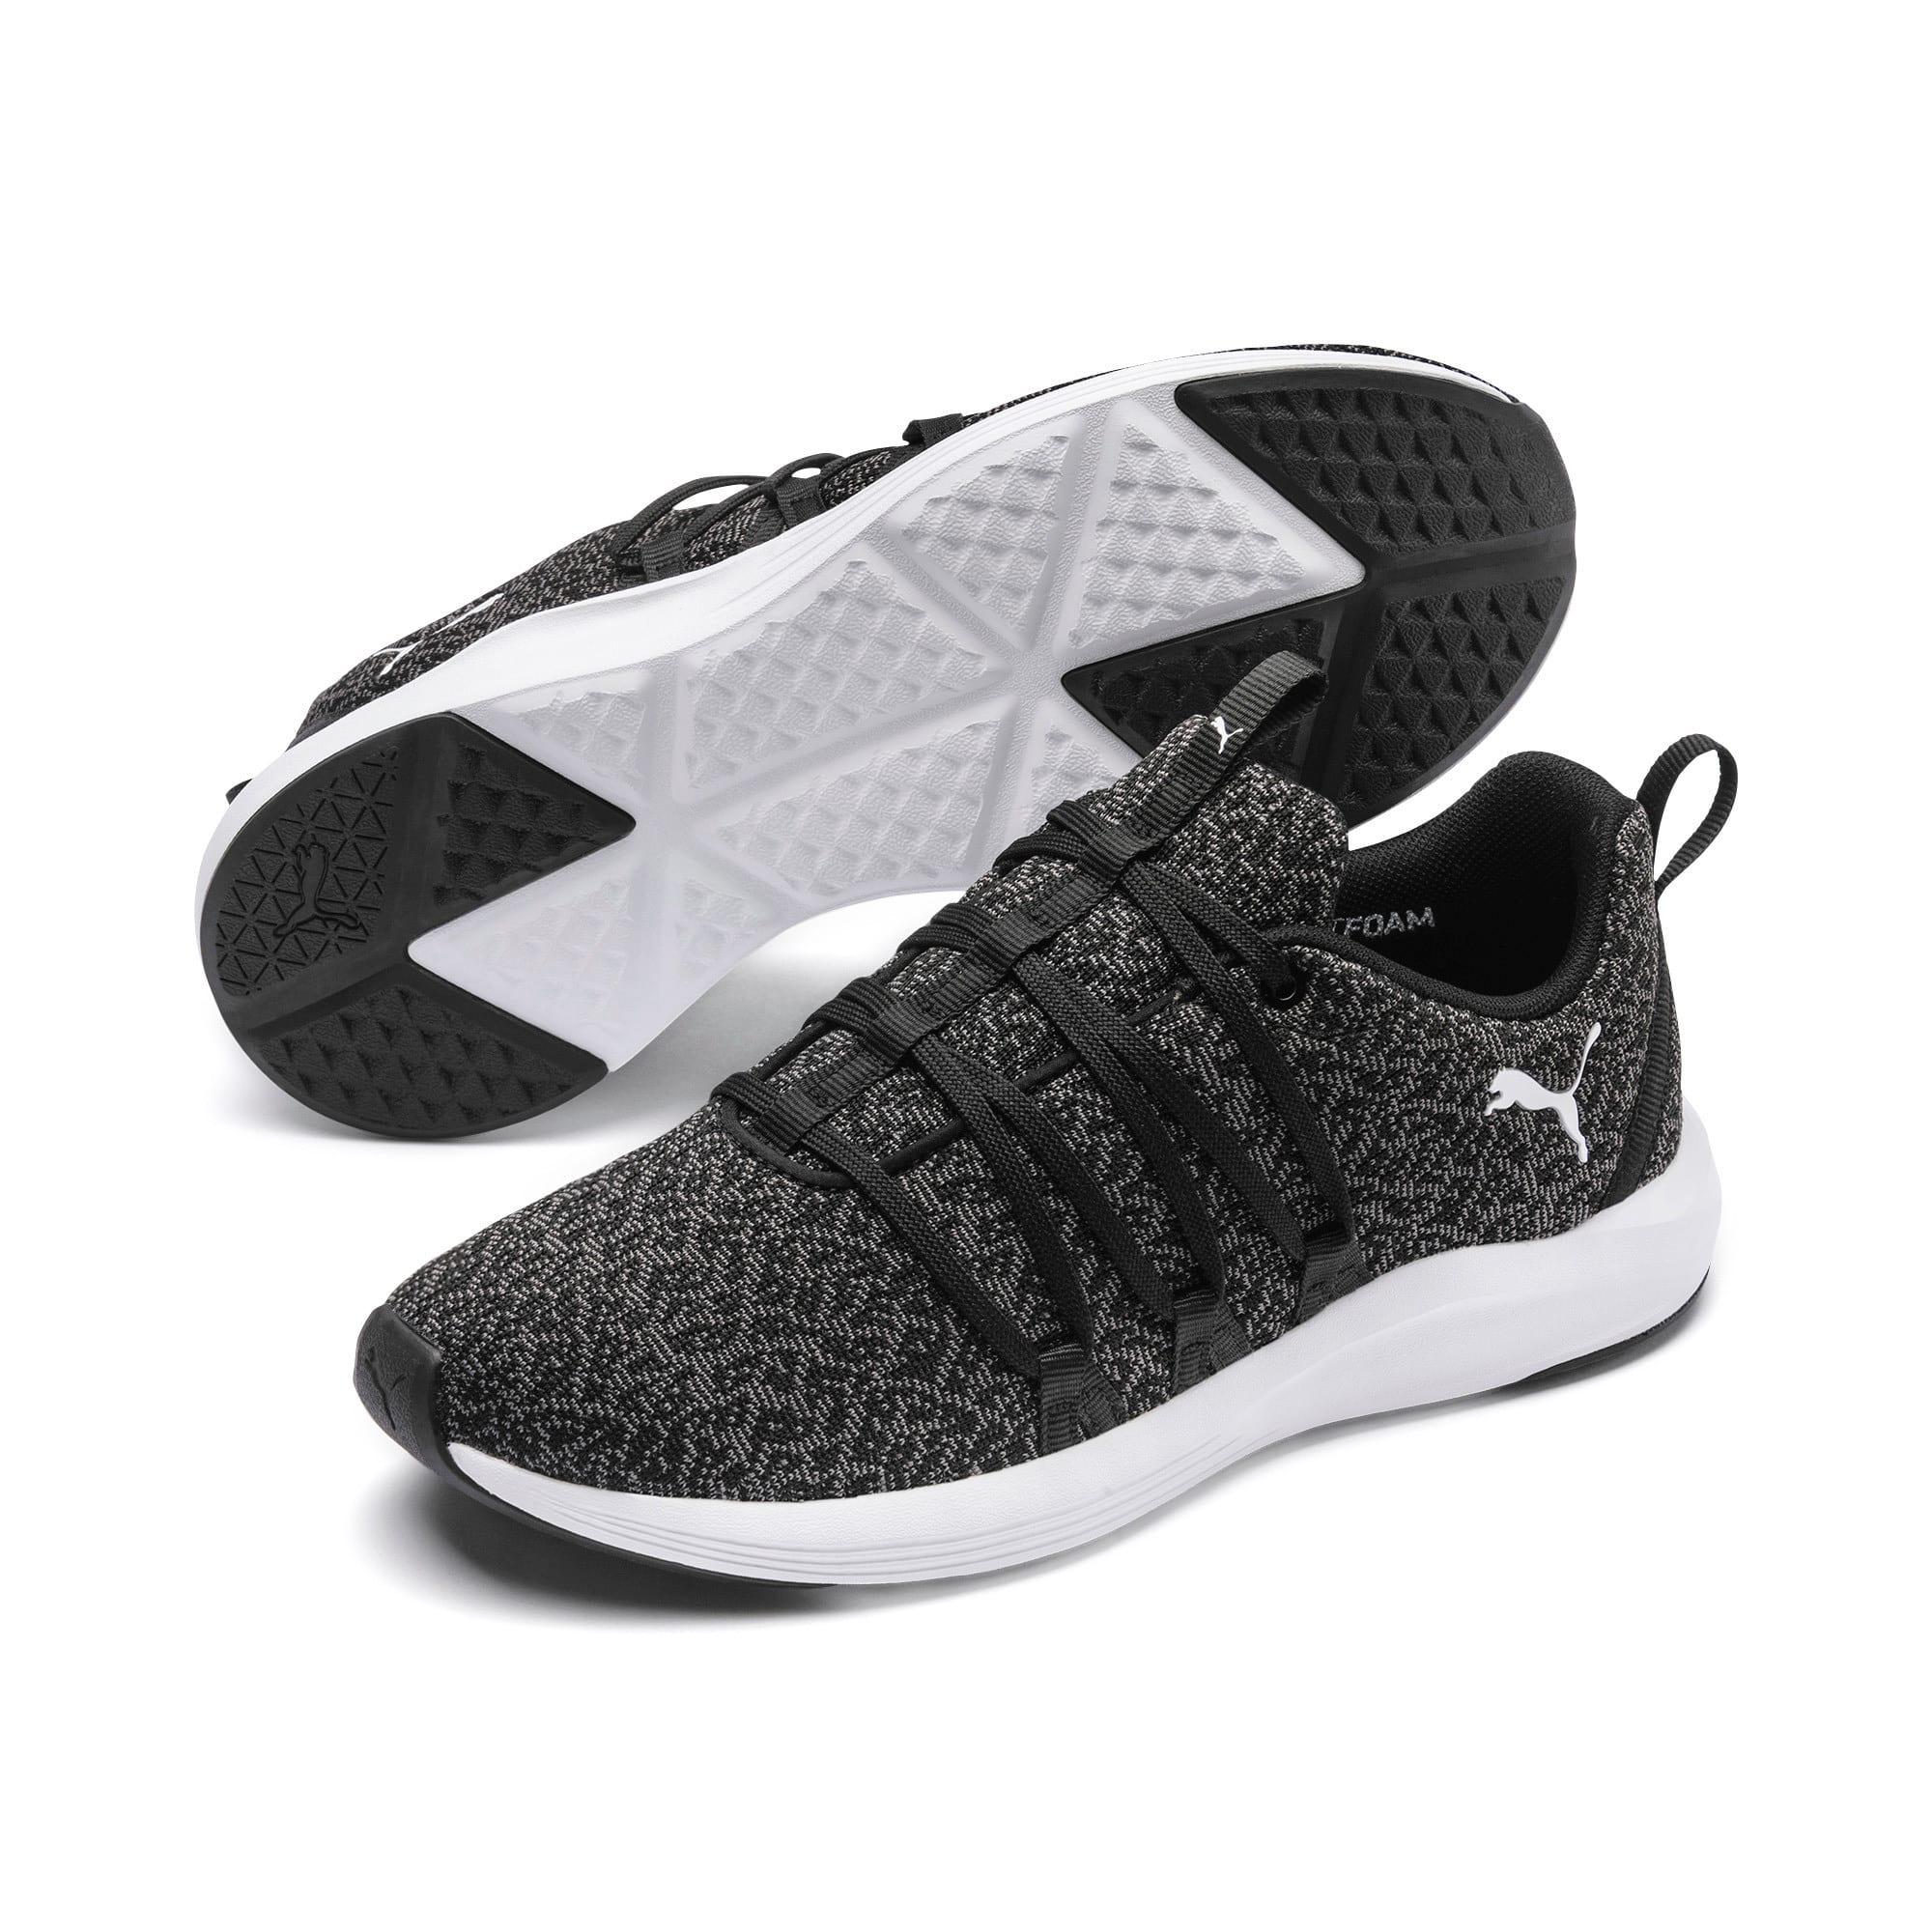 Thumbnail 2 of Prowl Alt Knit Women's Training Shoes, Puma Black-Puma White, medium